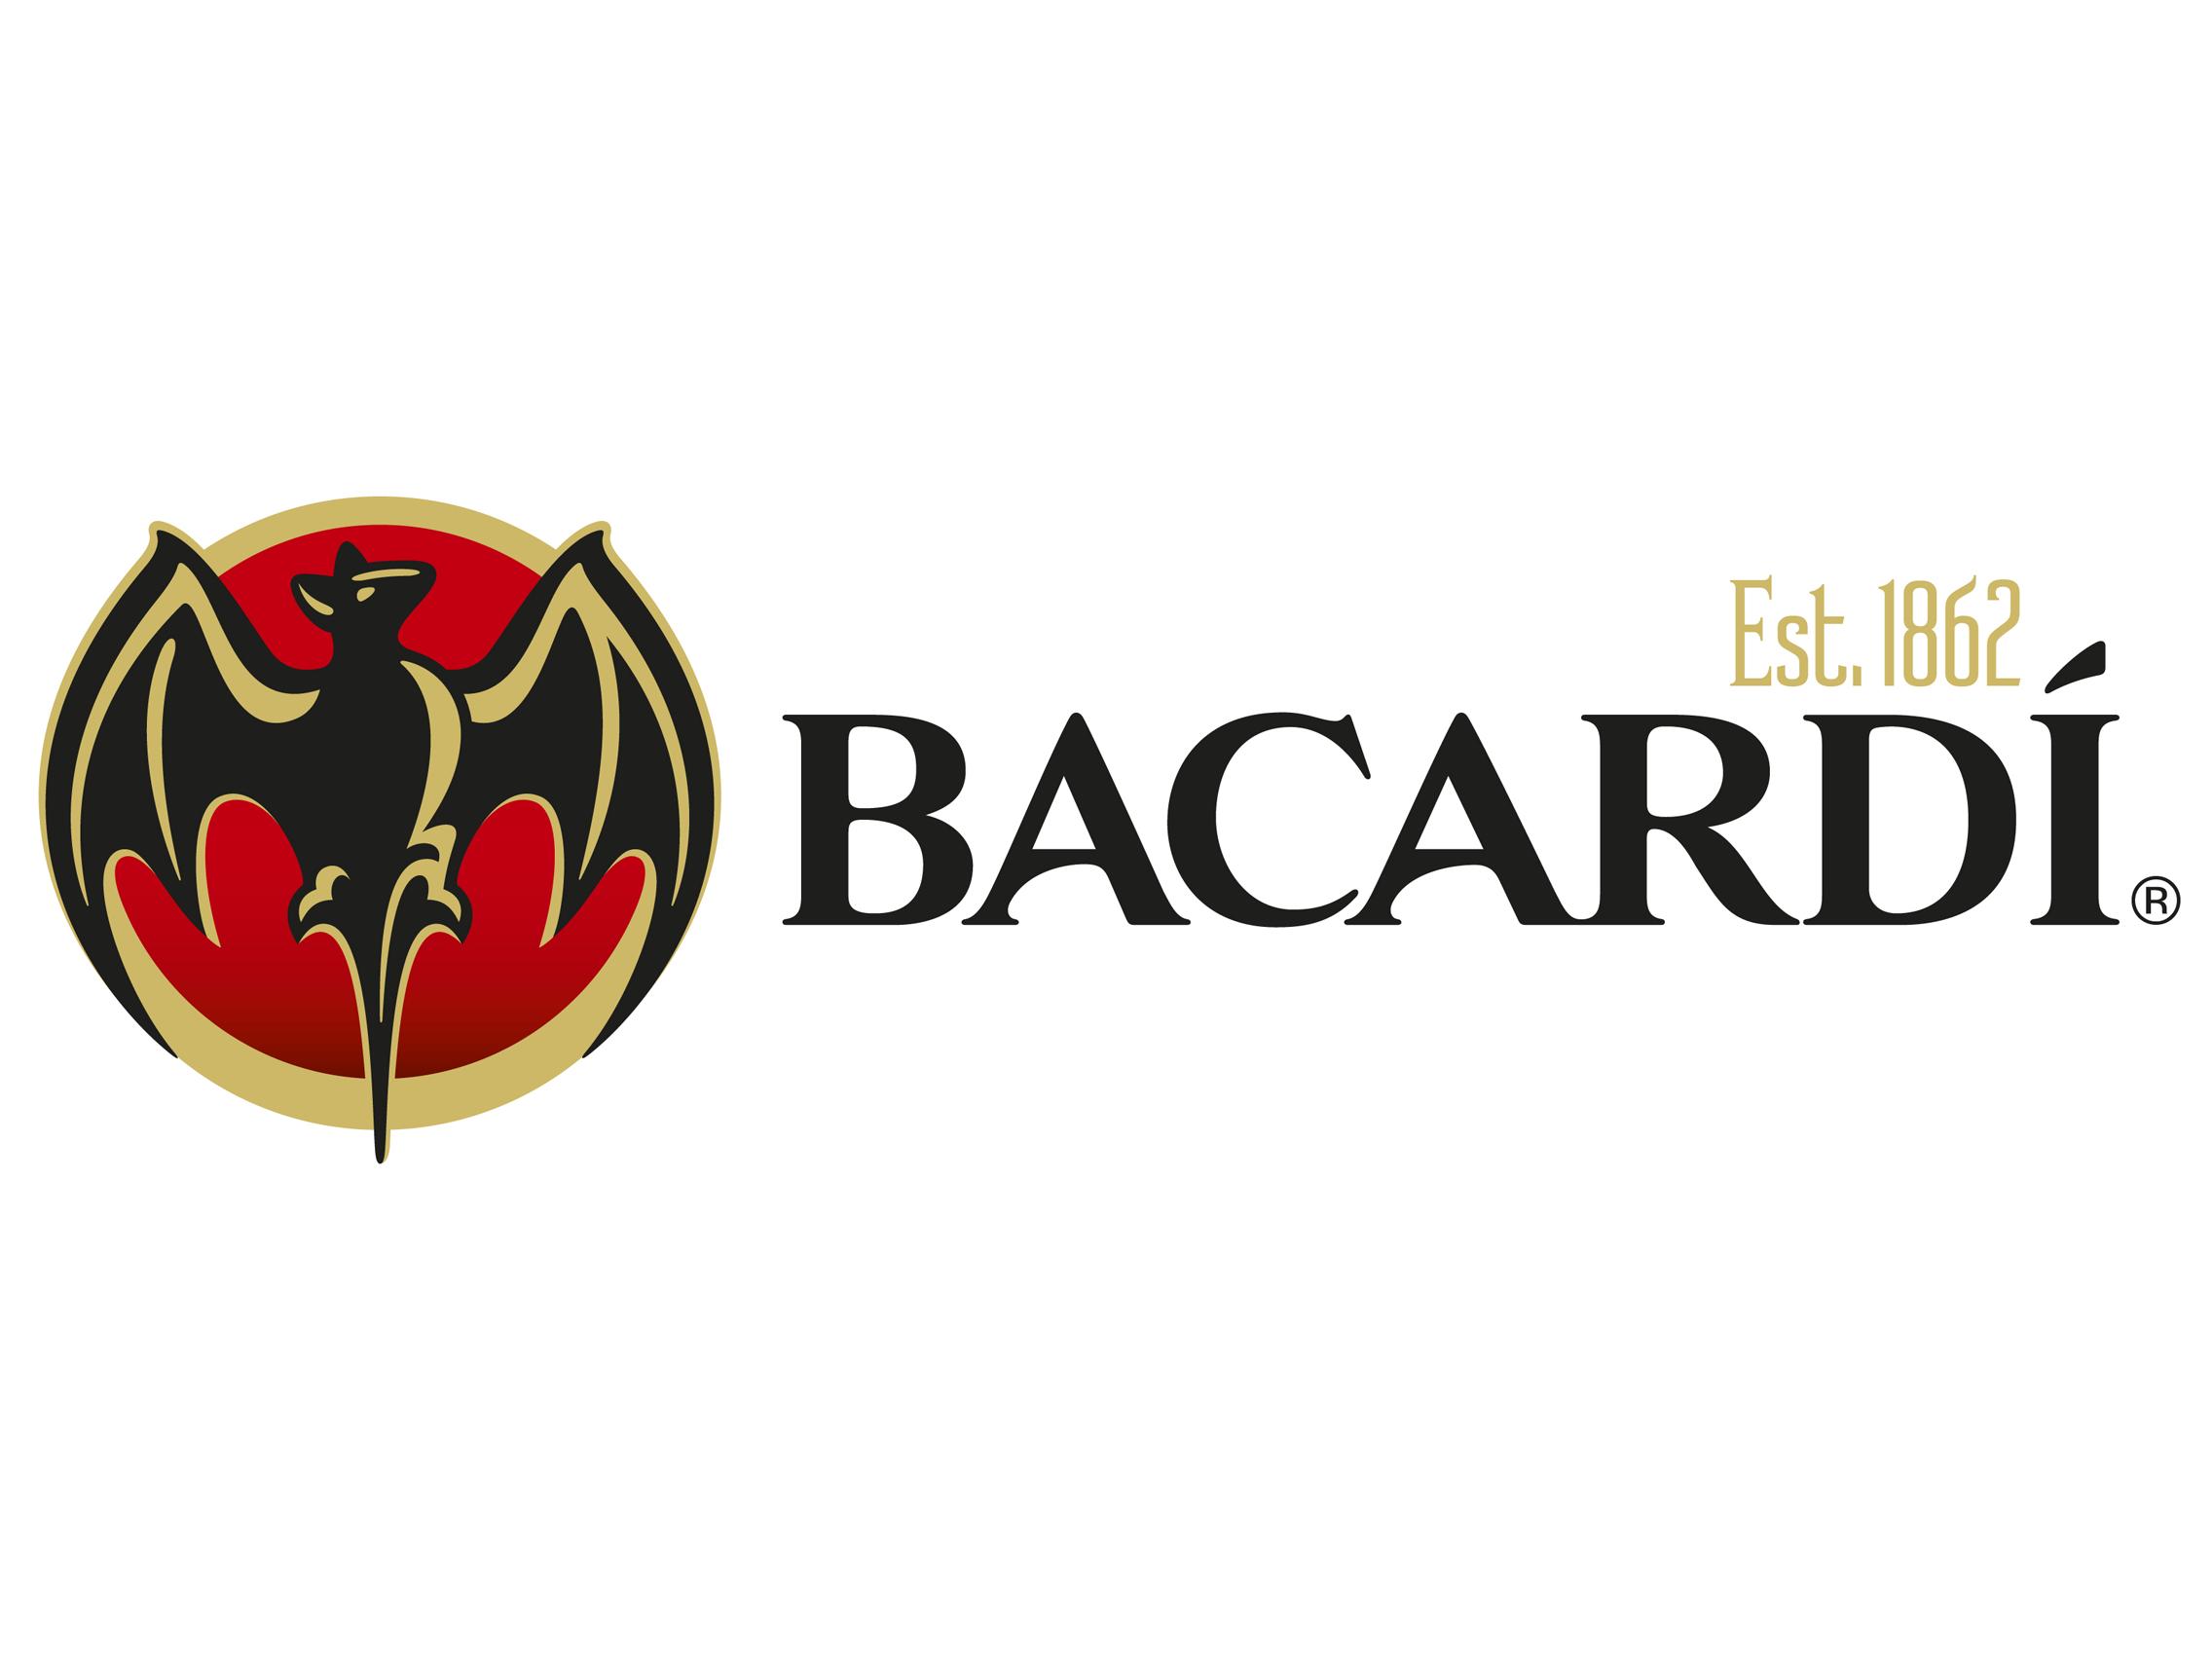 Filename: Bacardi_logo-5.png - Bacardi Limited Vector PNG